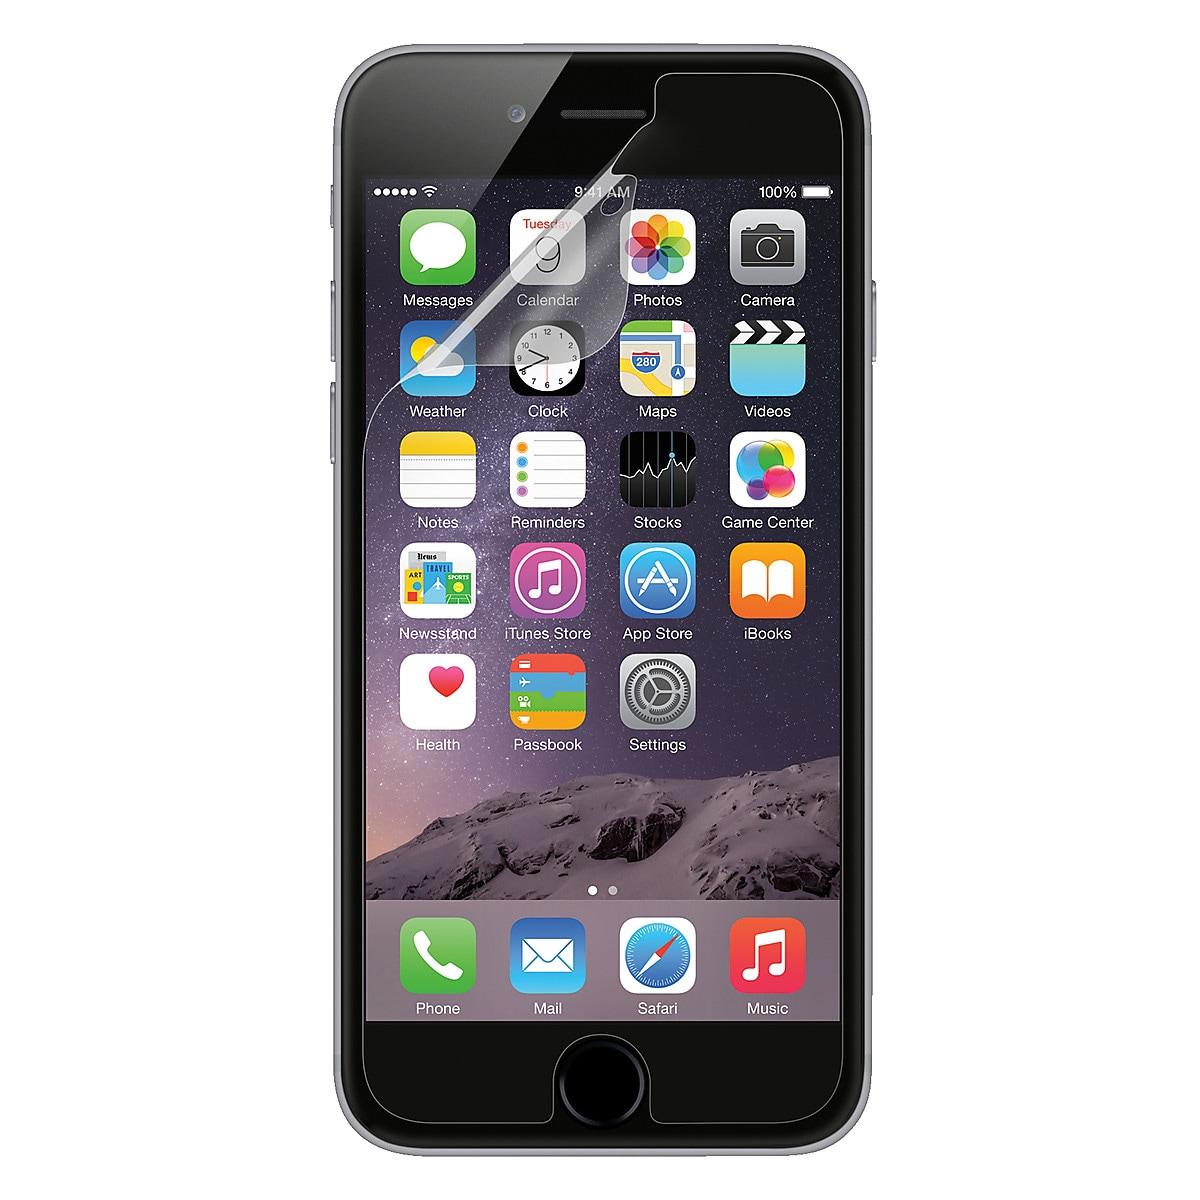 Belkin Screen Protectors for iPhone 6/6S, 3-pack